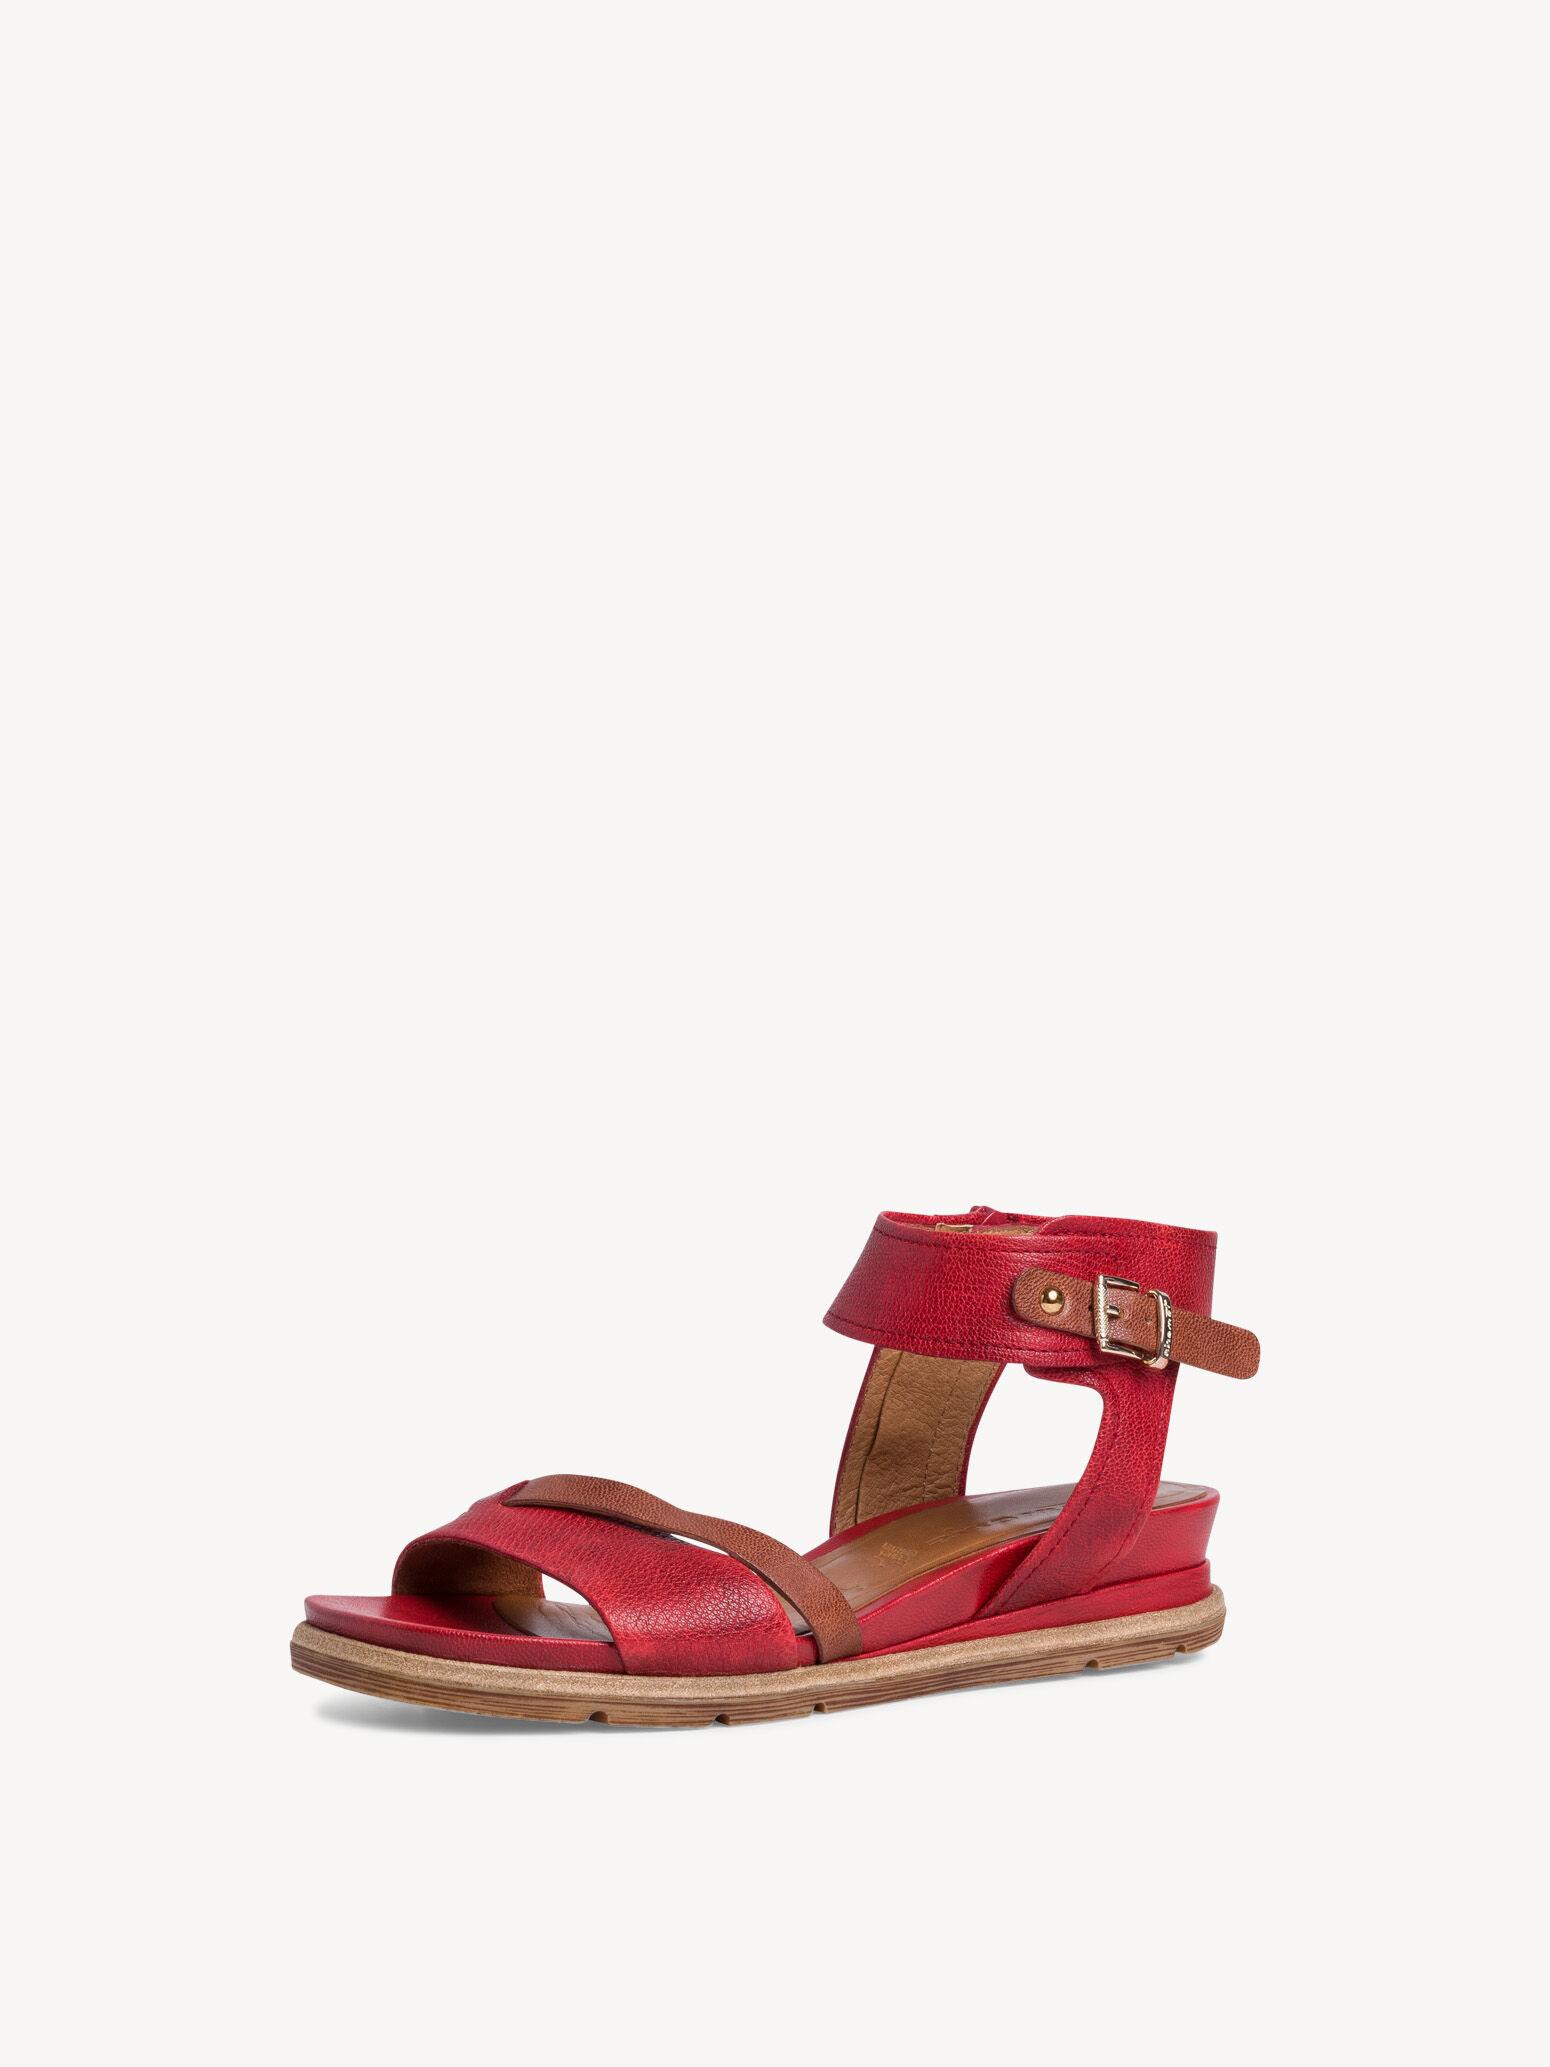 sandale-compensée-en-cuir-rouge-tamaris-28218-547_2